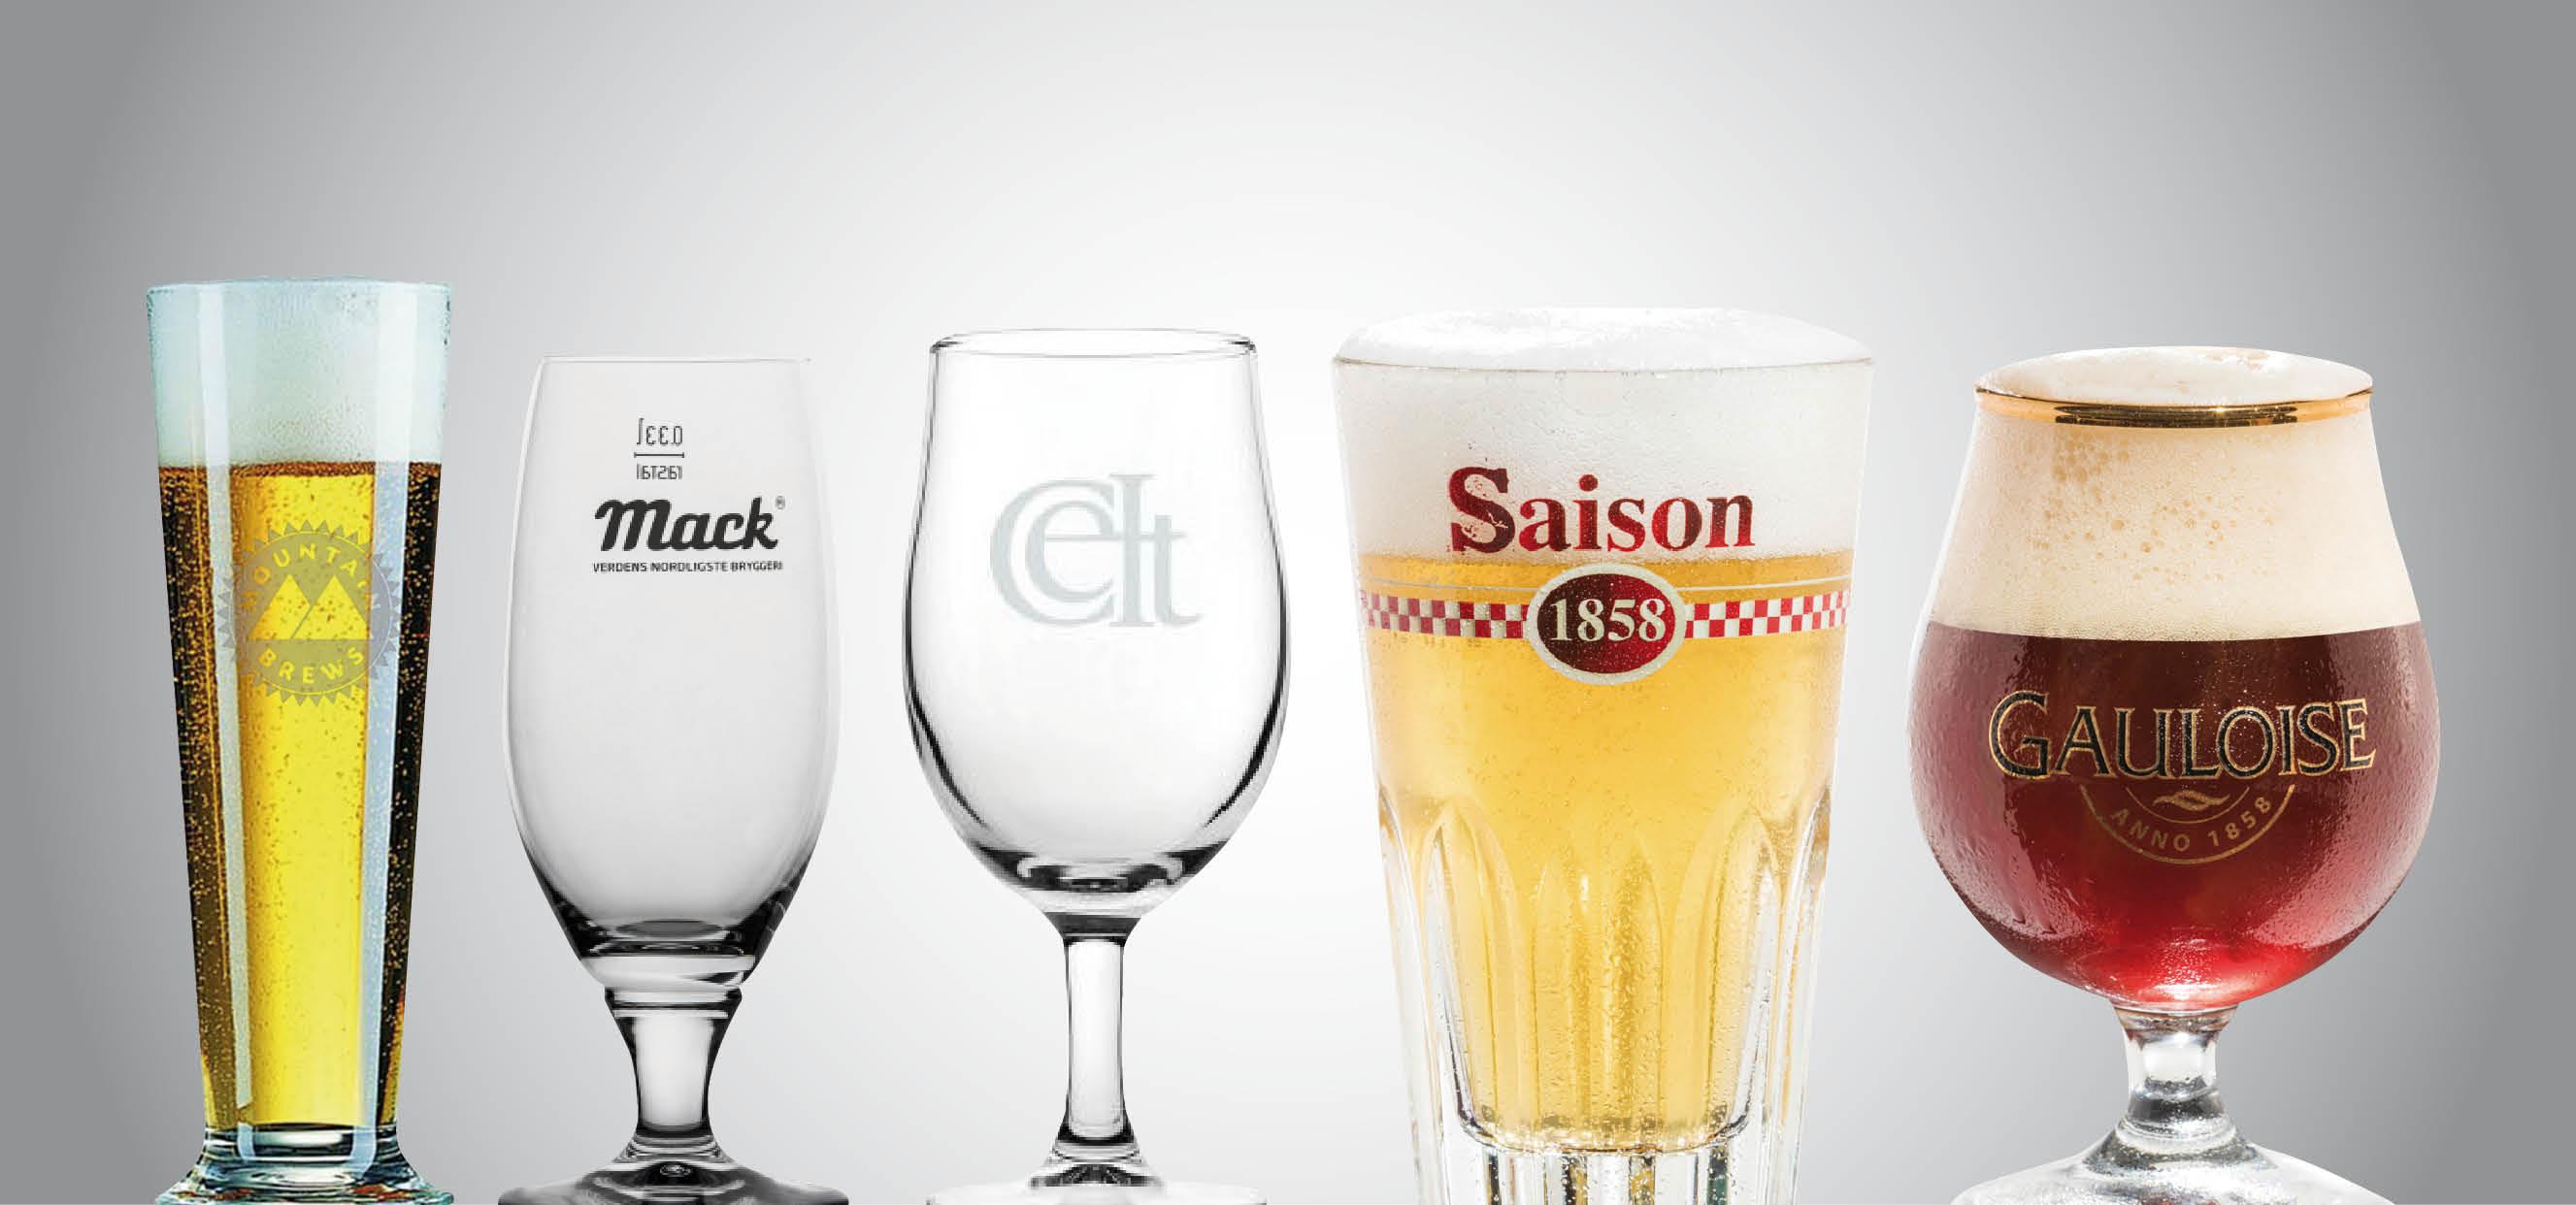 Glas från Mountain Brews, Mack, Celt, Saison och Gauloise